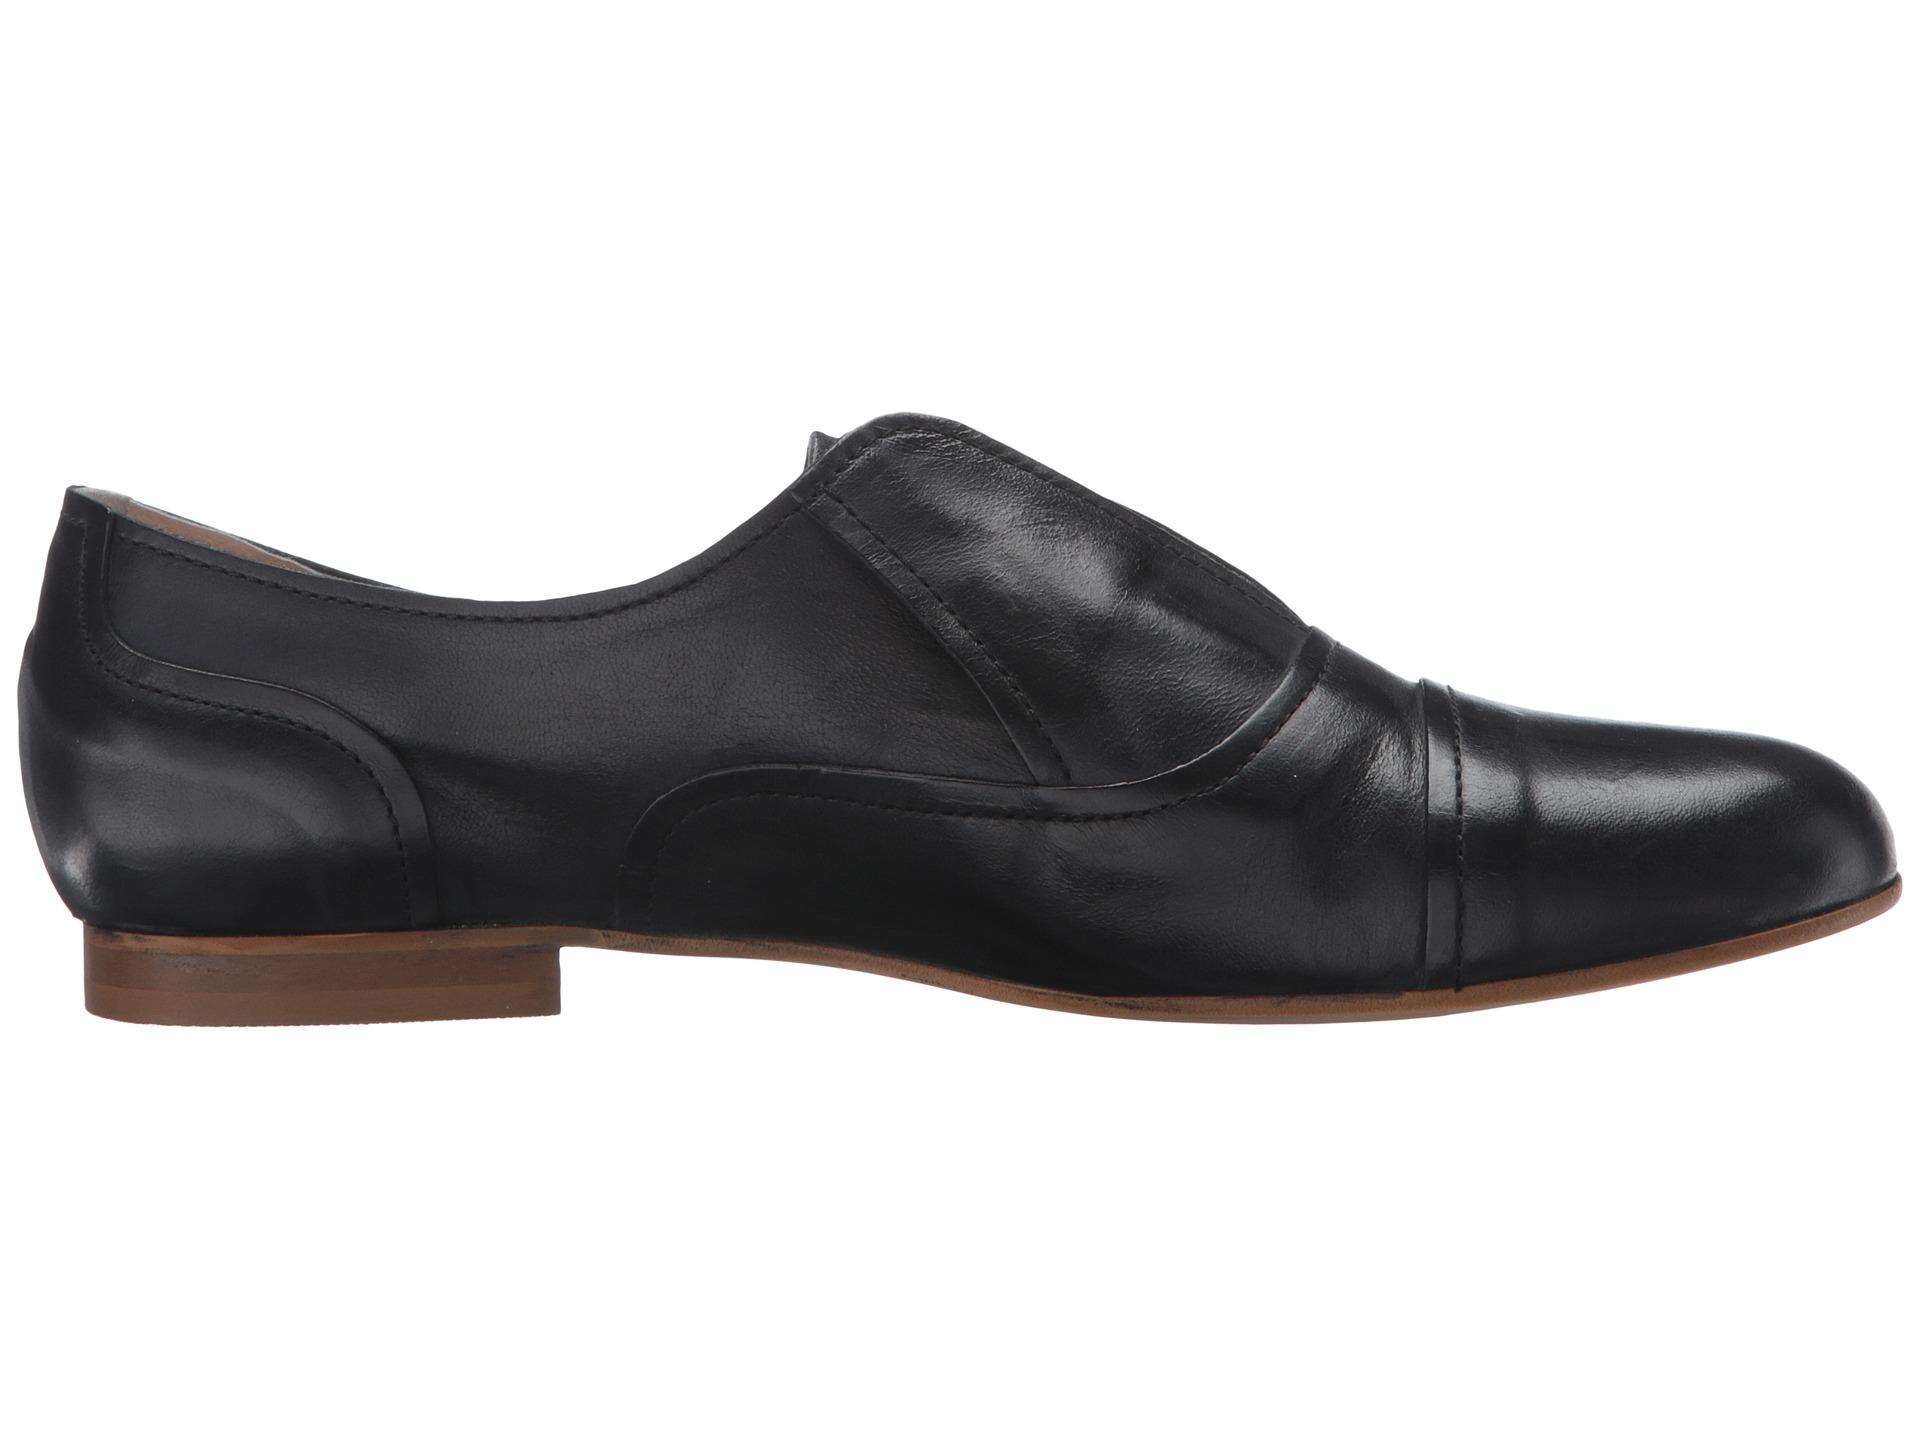 Oxford Shoes Matte Black